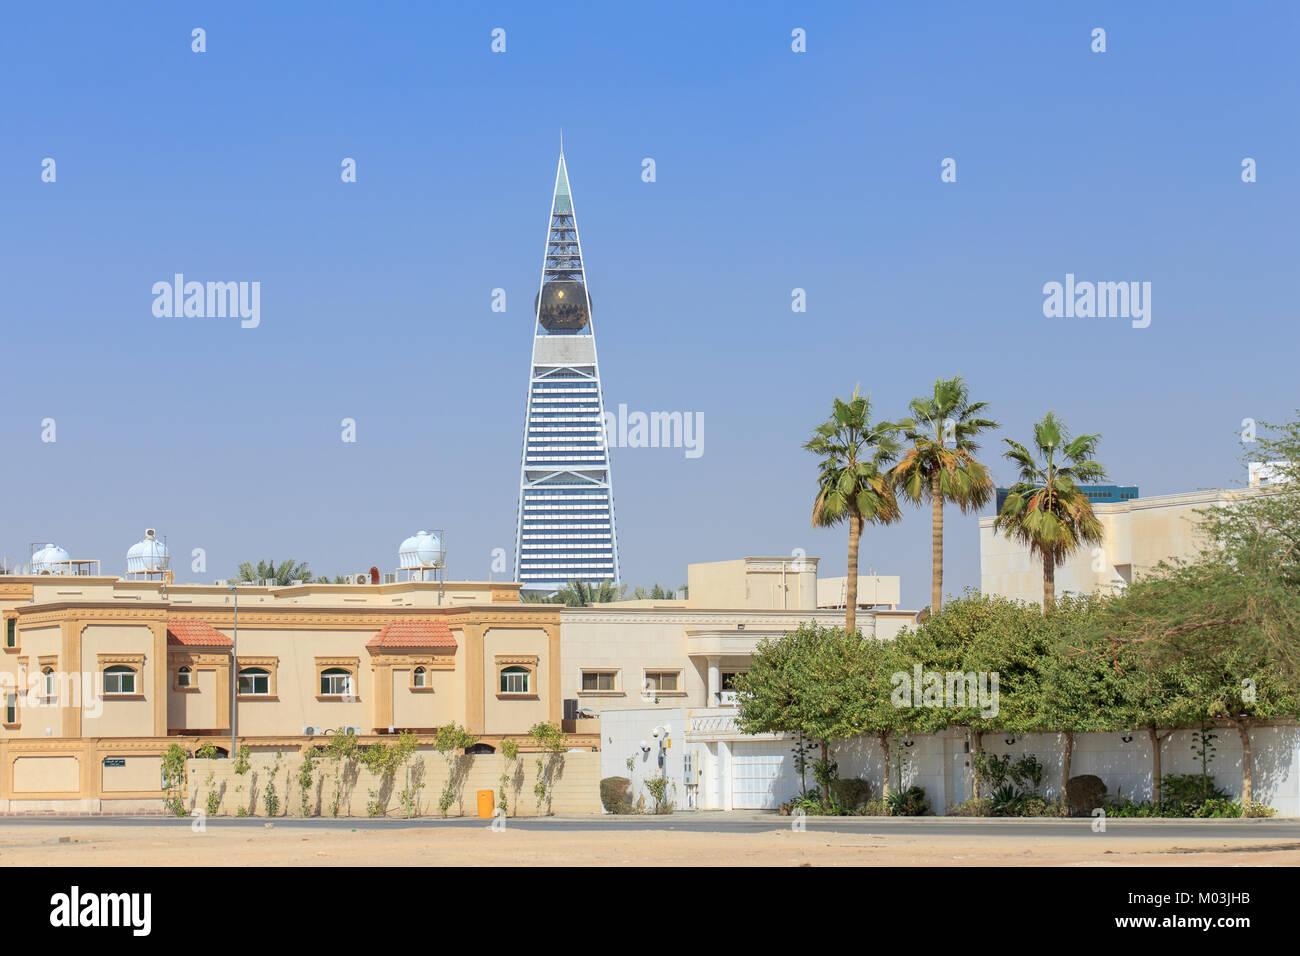 Cityscape of Riyadh in Saudi Arabia - Stock Image